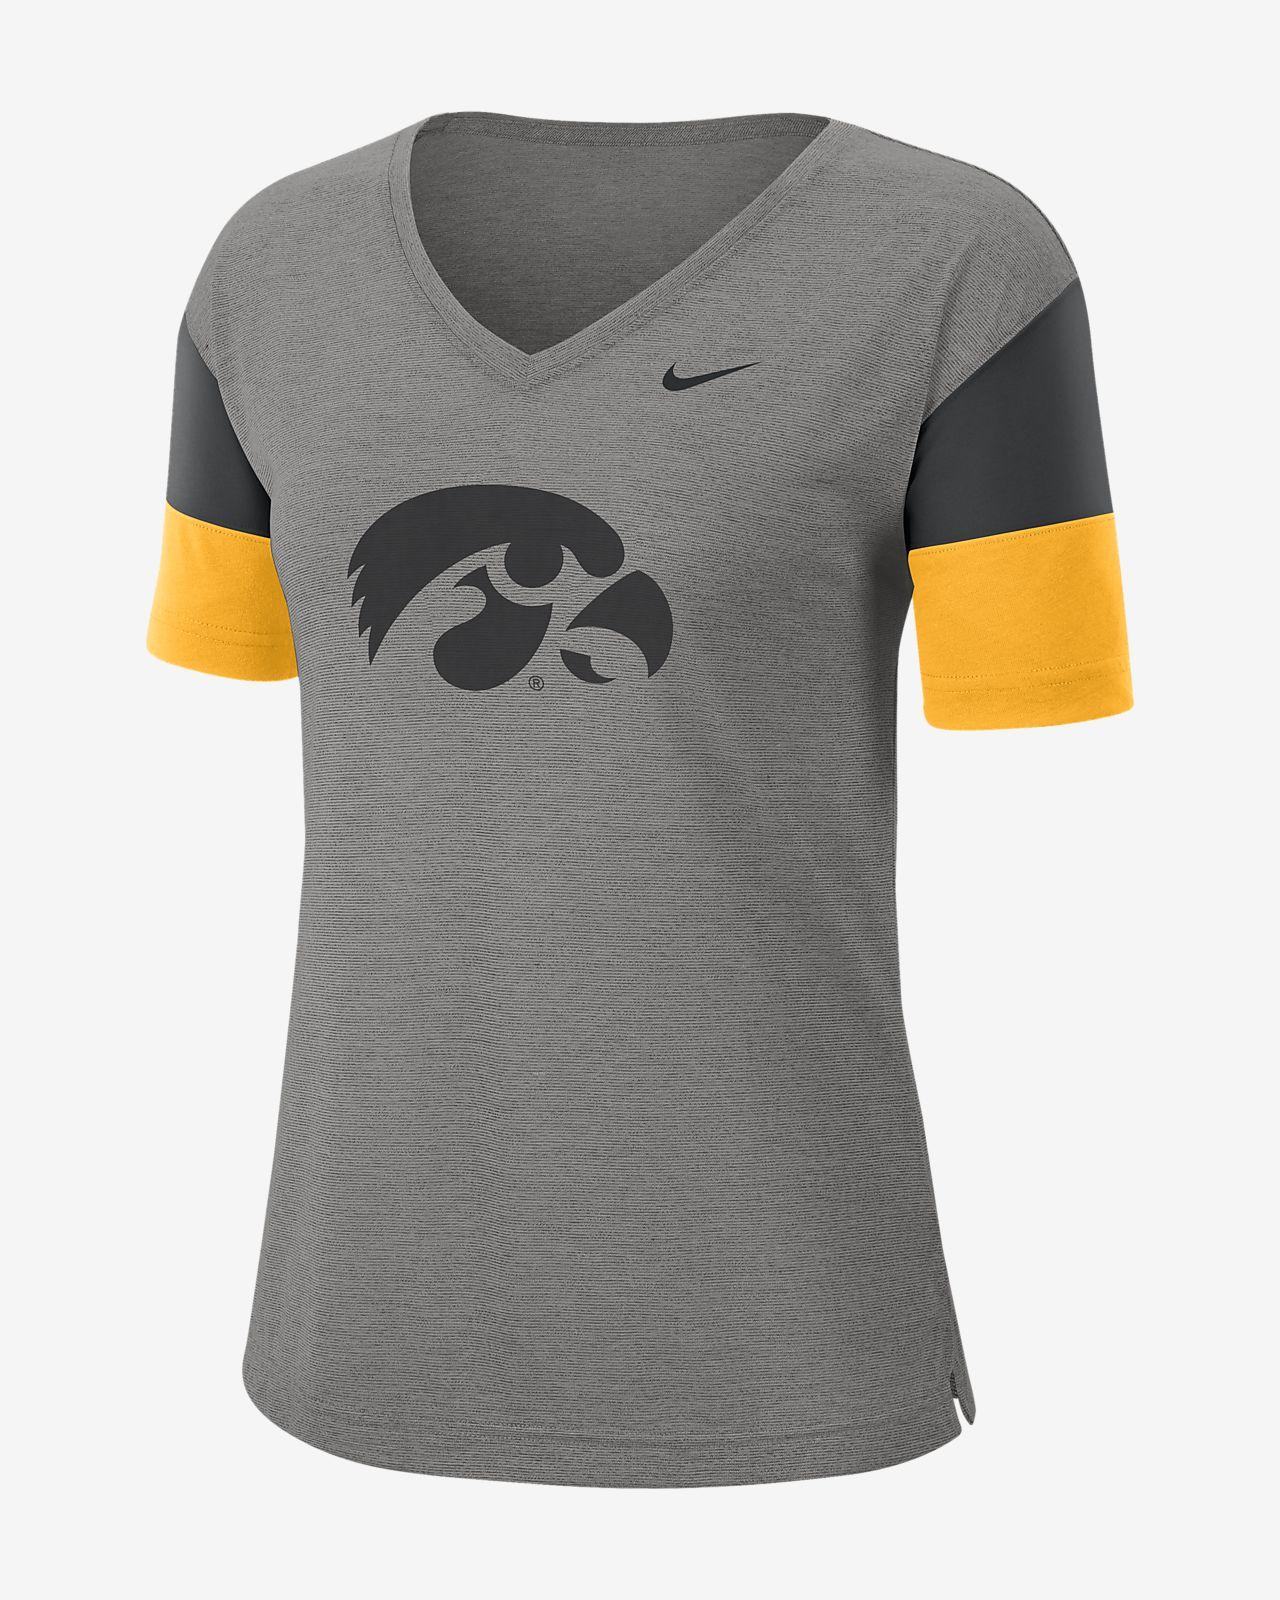 Nike College Breathe (Iowa) Women's Short-Sleeve V-Neck Top